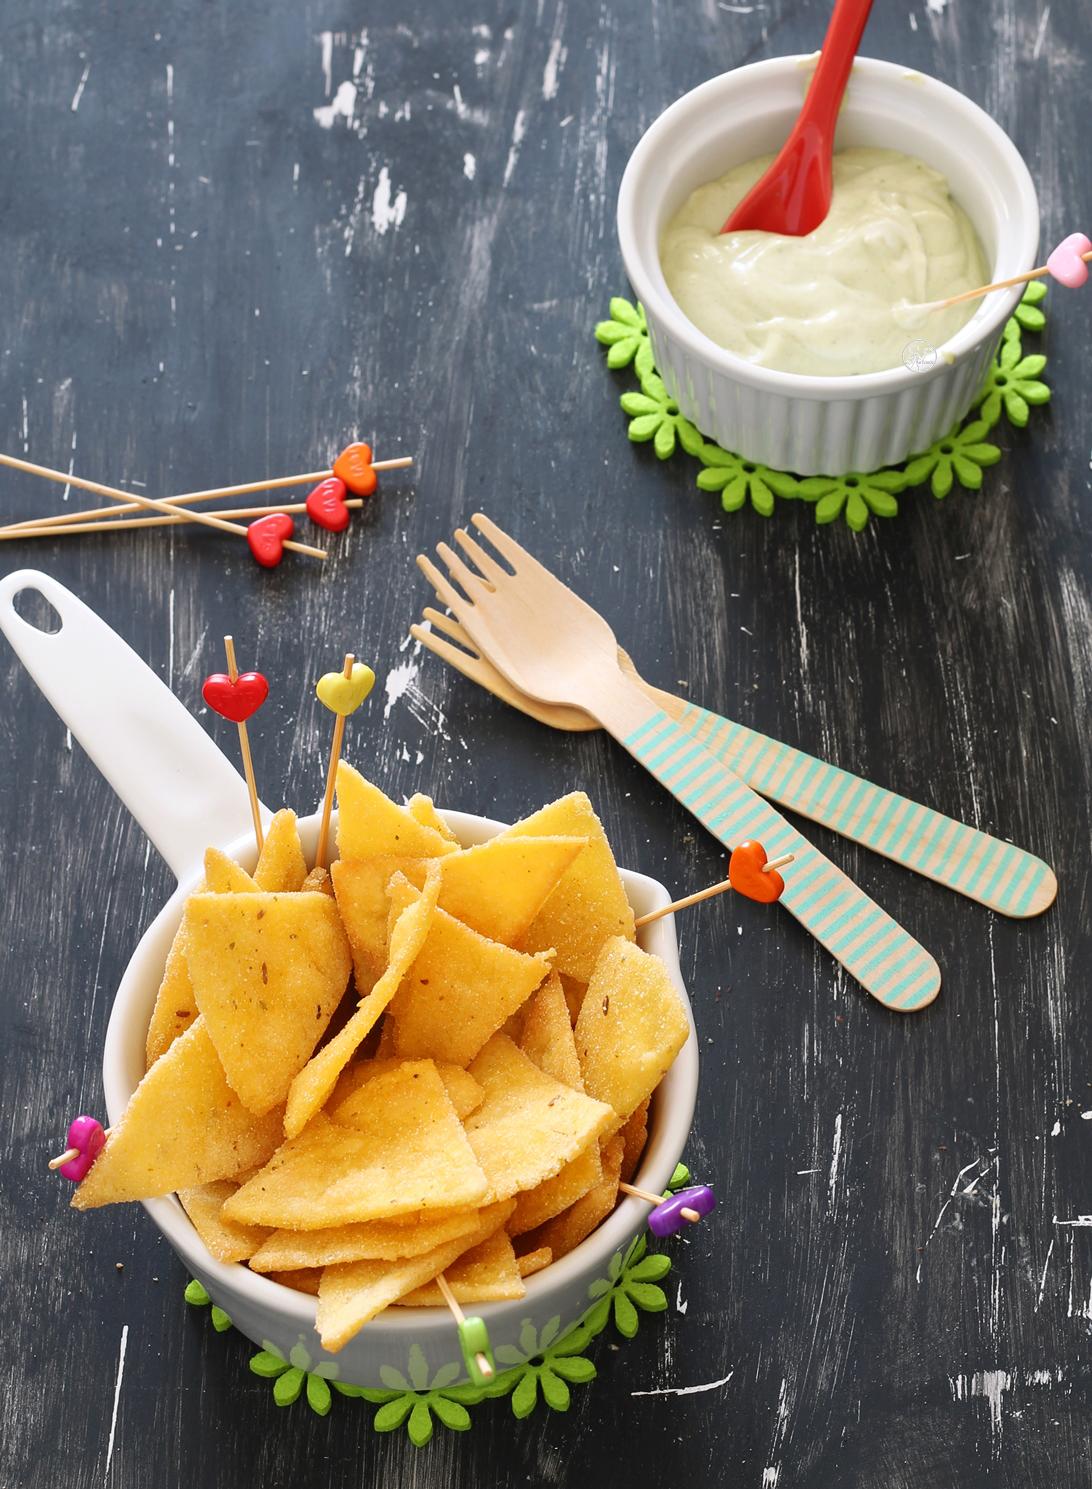 Nachos sans gluten - La Cassata Celiaca